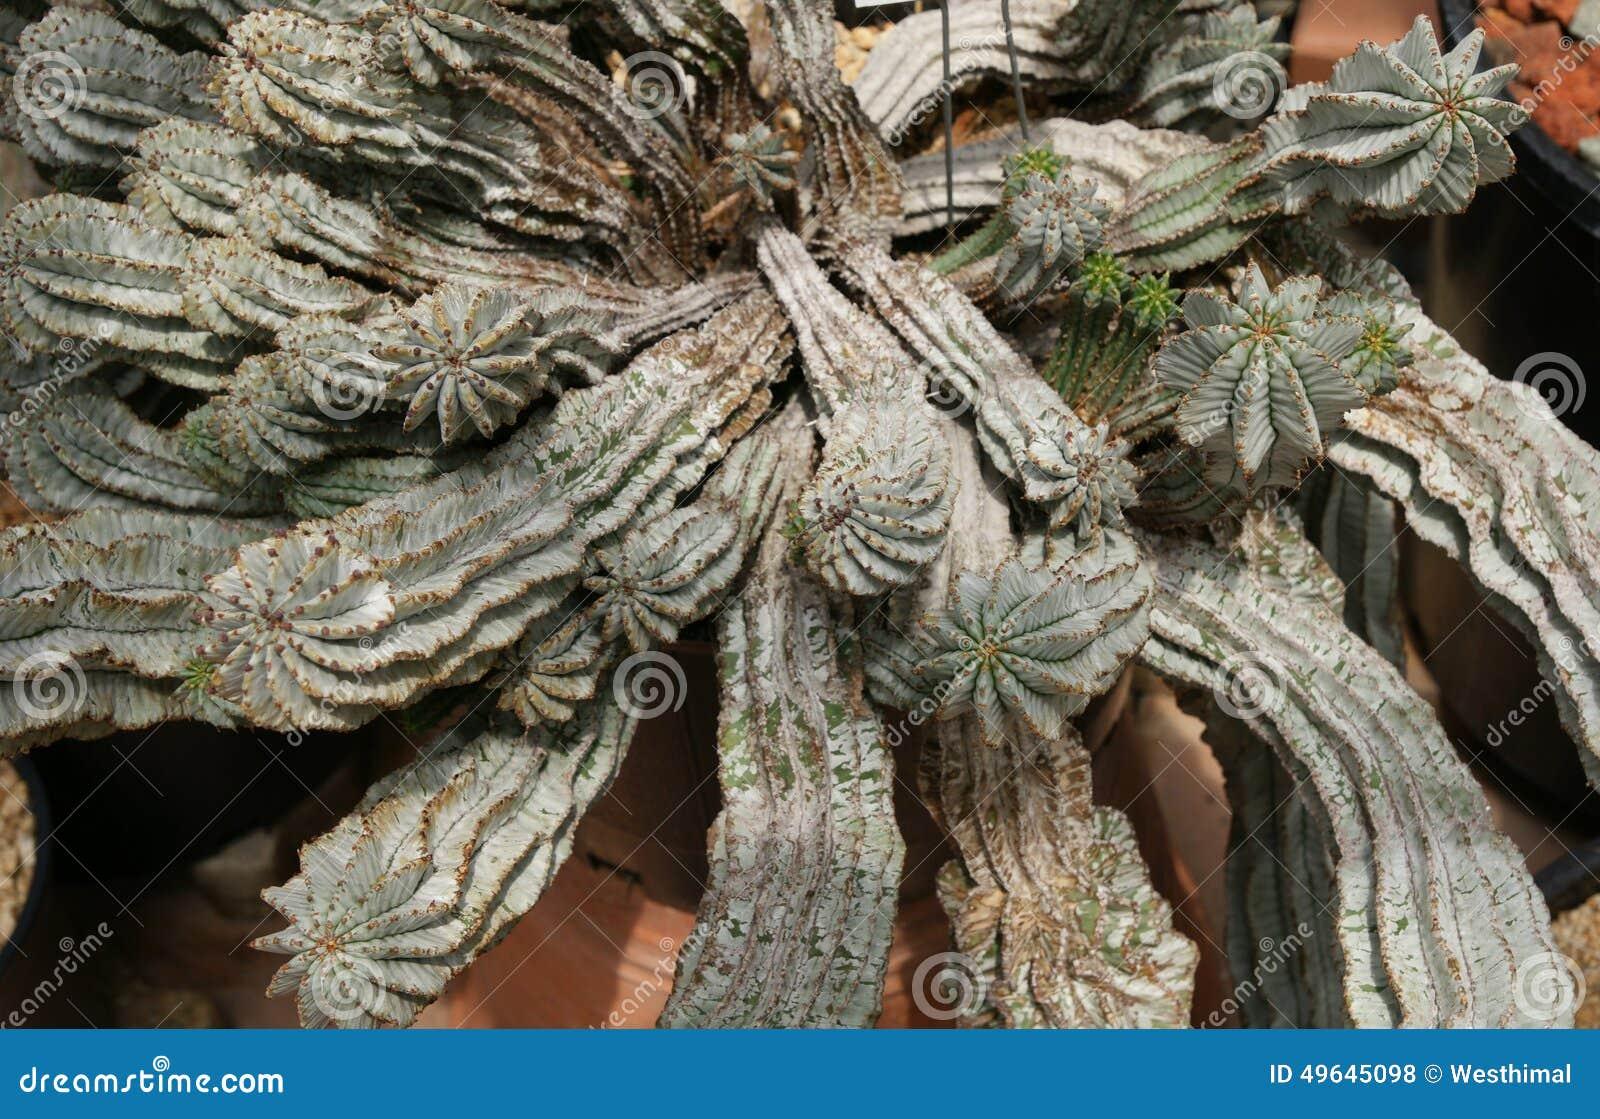 Euphorbia Horrida, Africa Milk Barrel Stock Photo - Image of